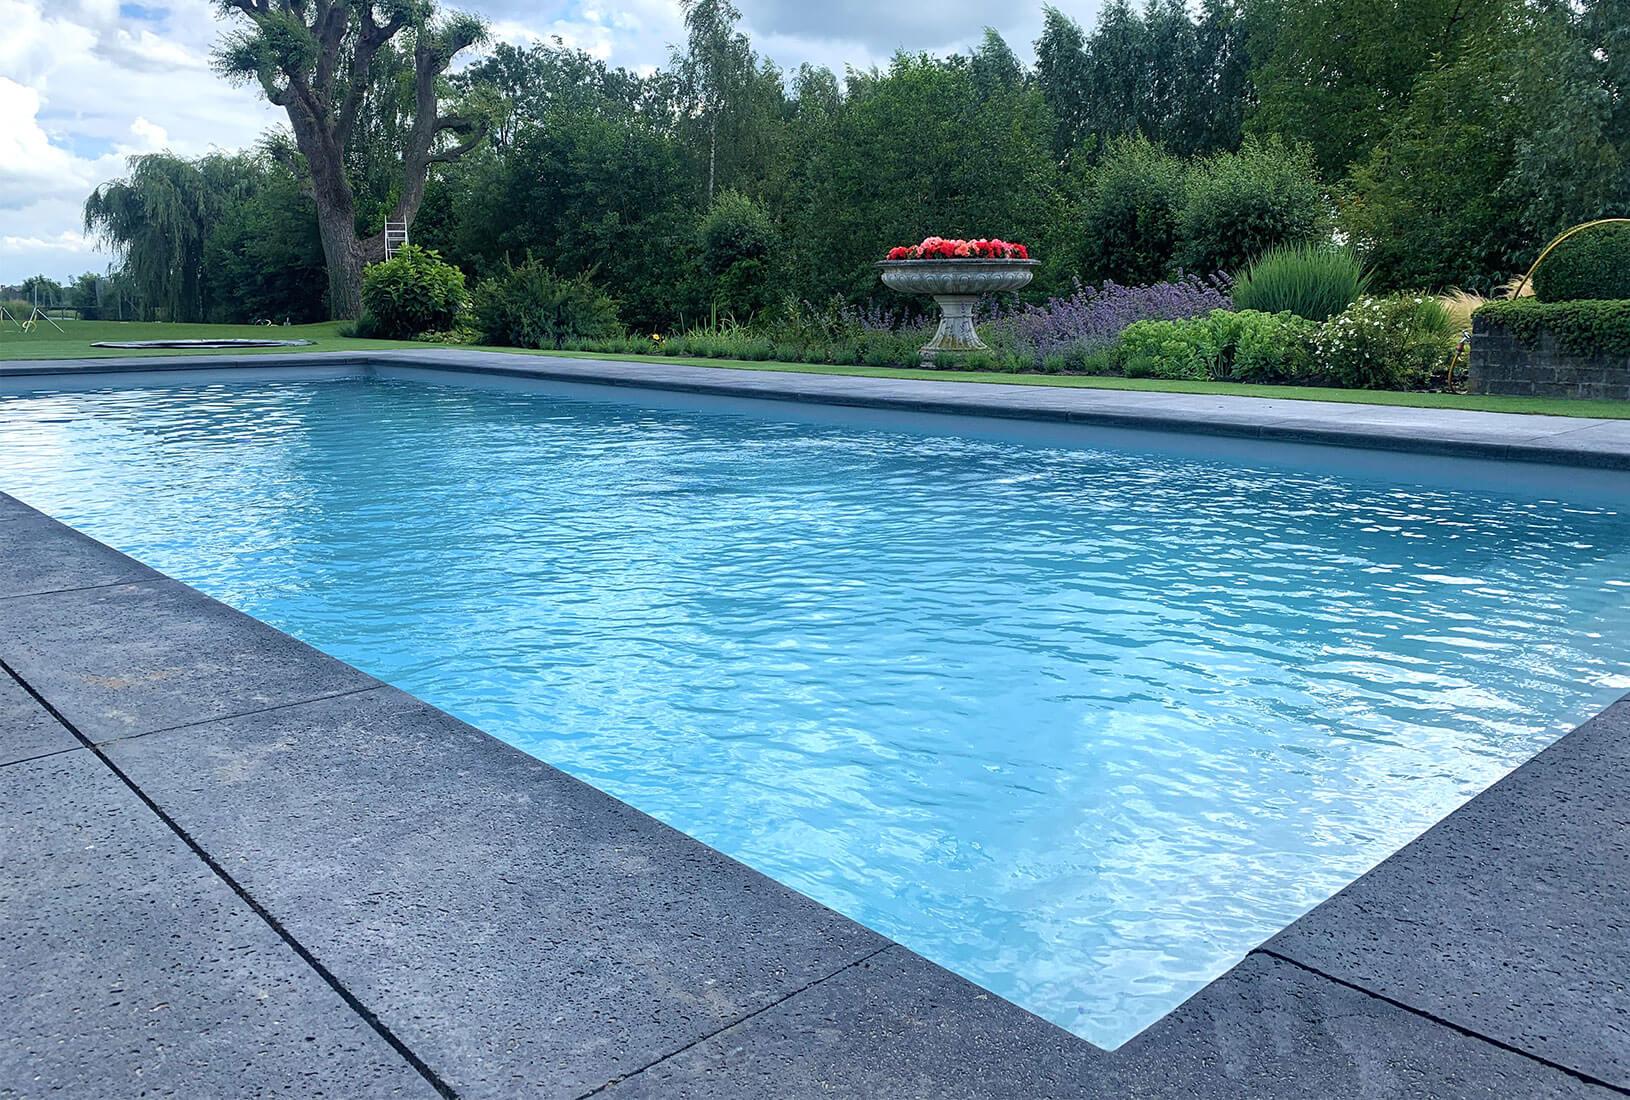 Innoblox_Bouwkundig zwembad